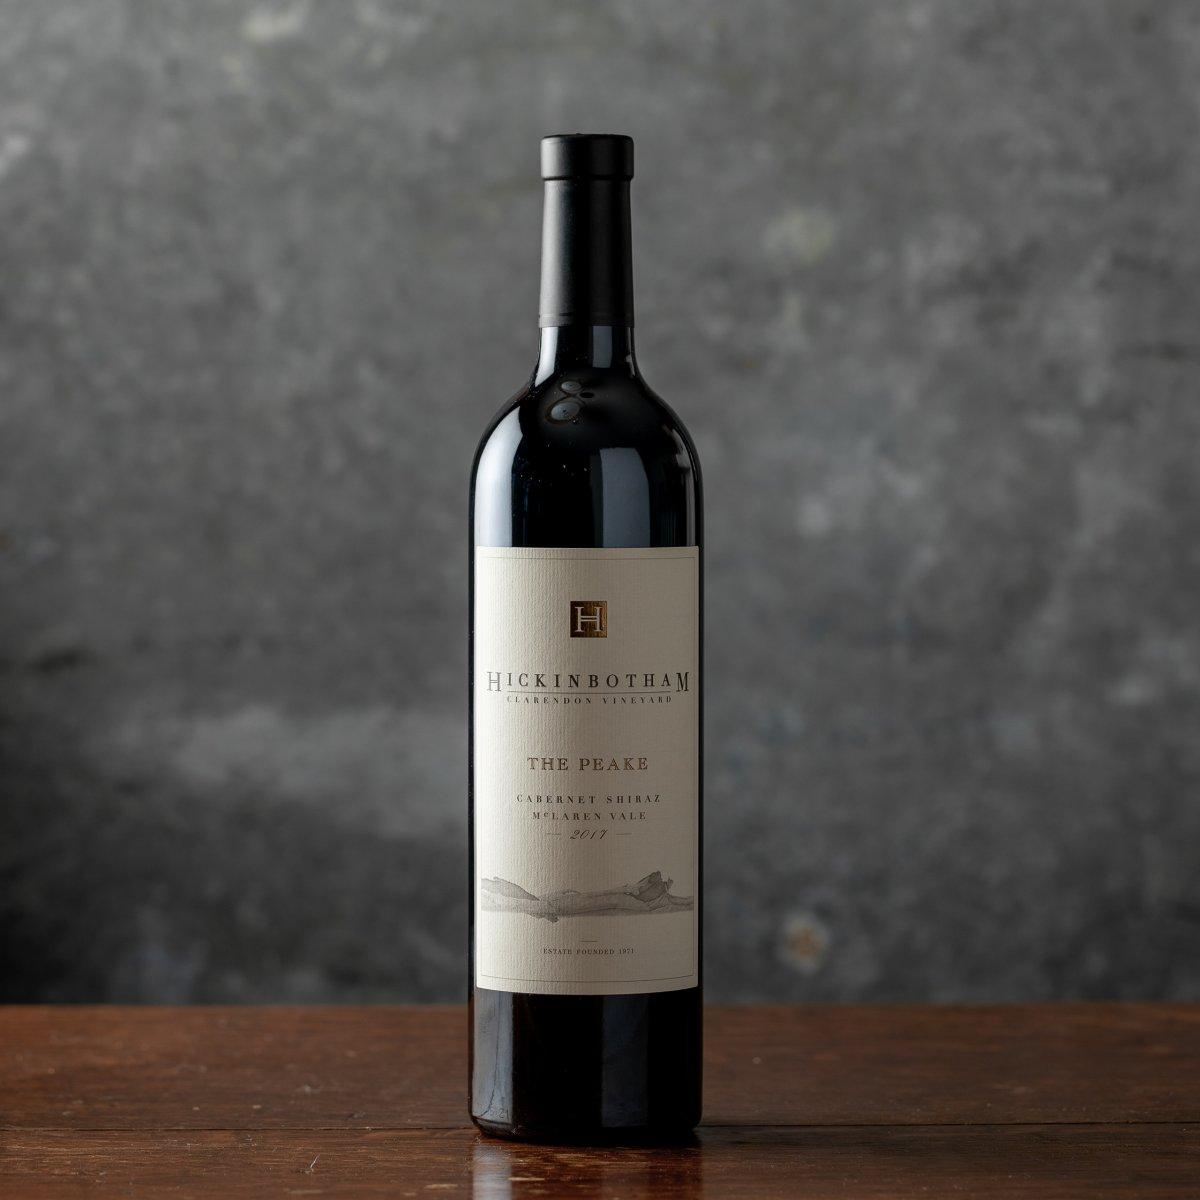 Wine bottle of The Peake Cabernet Shiraz against a gray backdrop